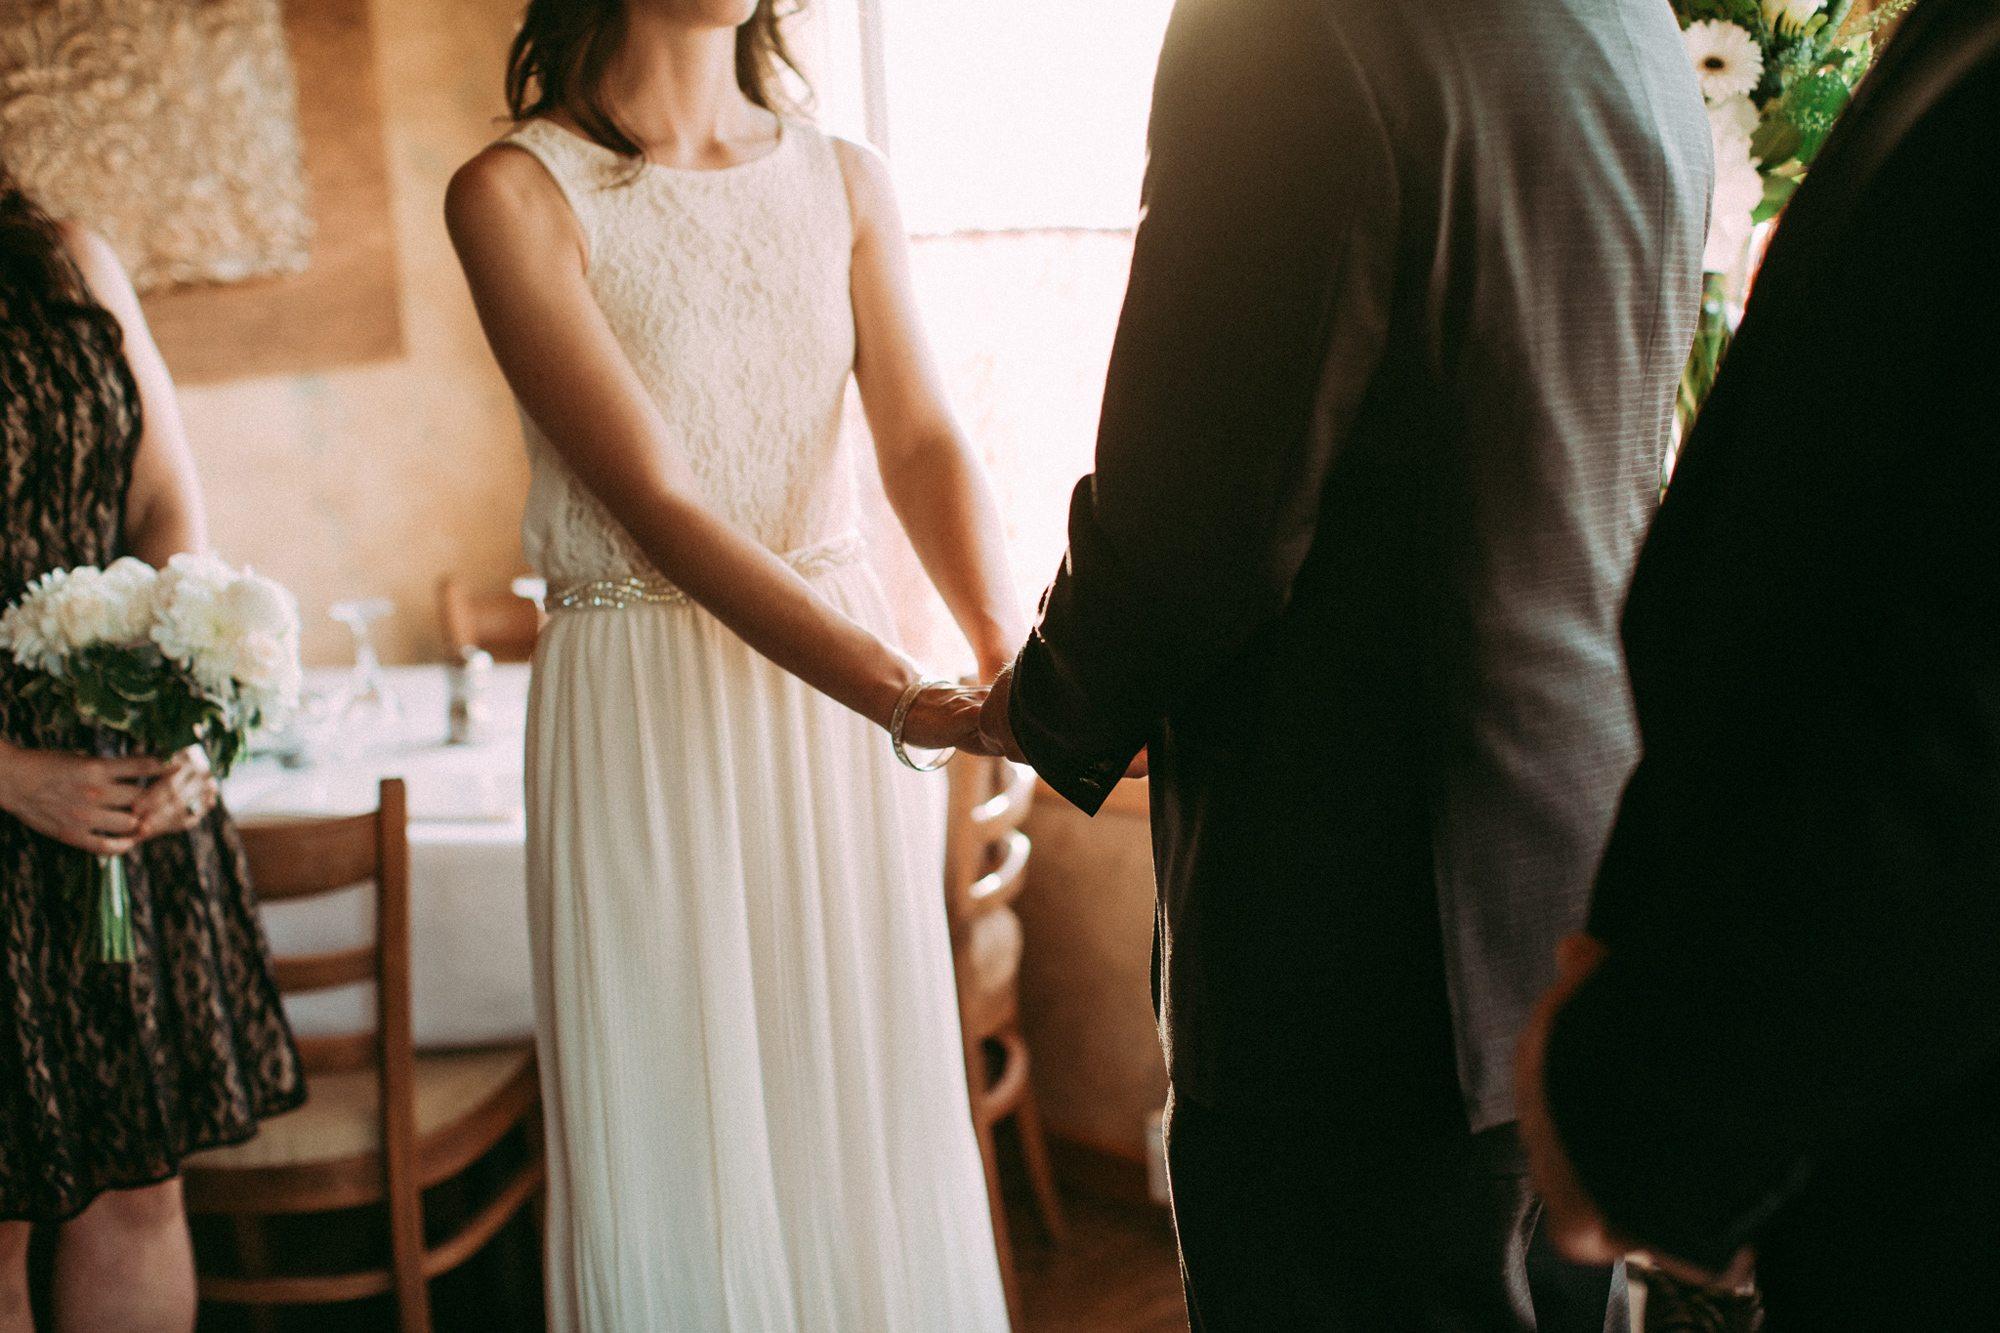 910-vancouver-elopement-photographer